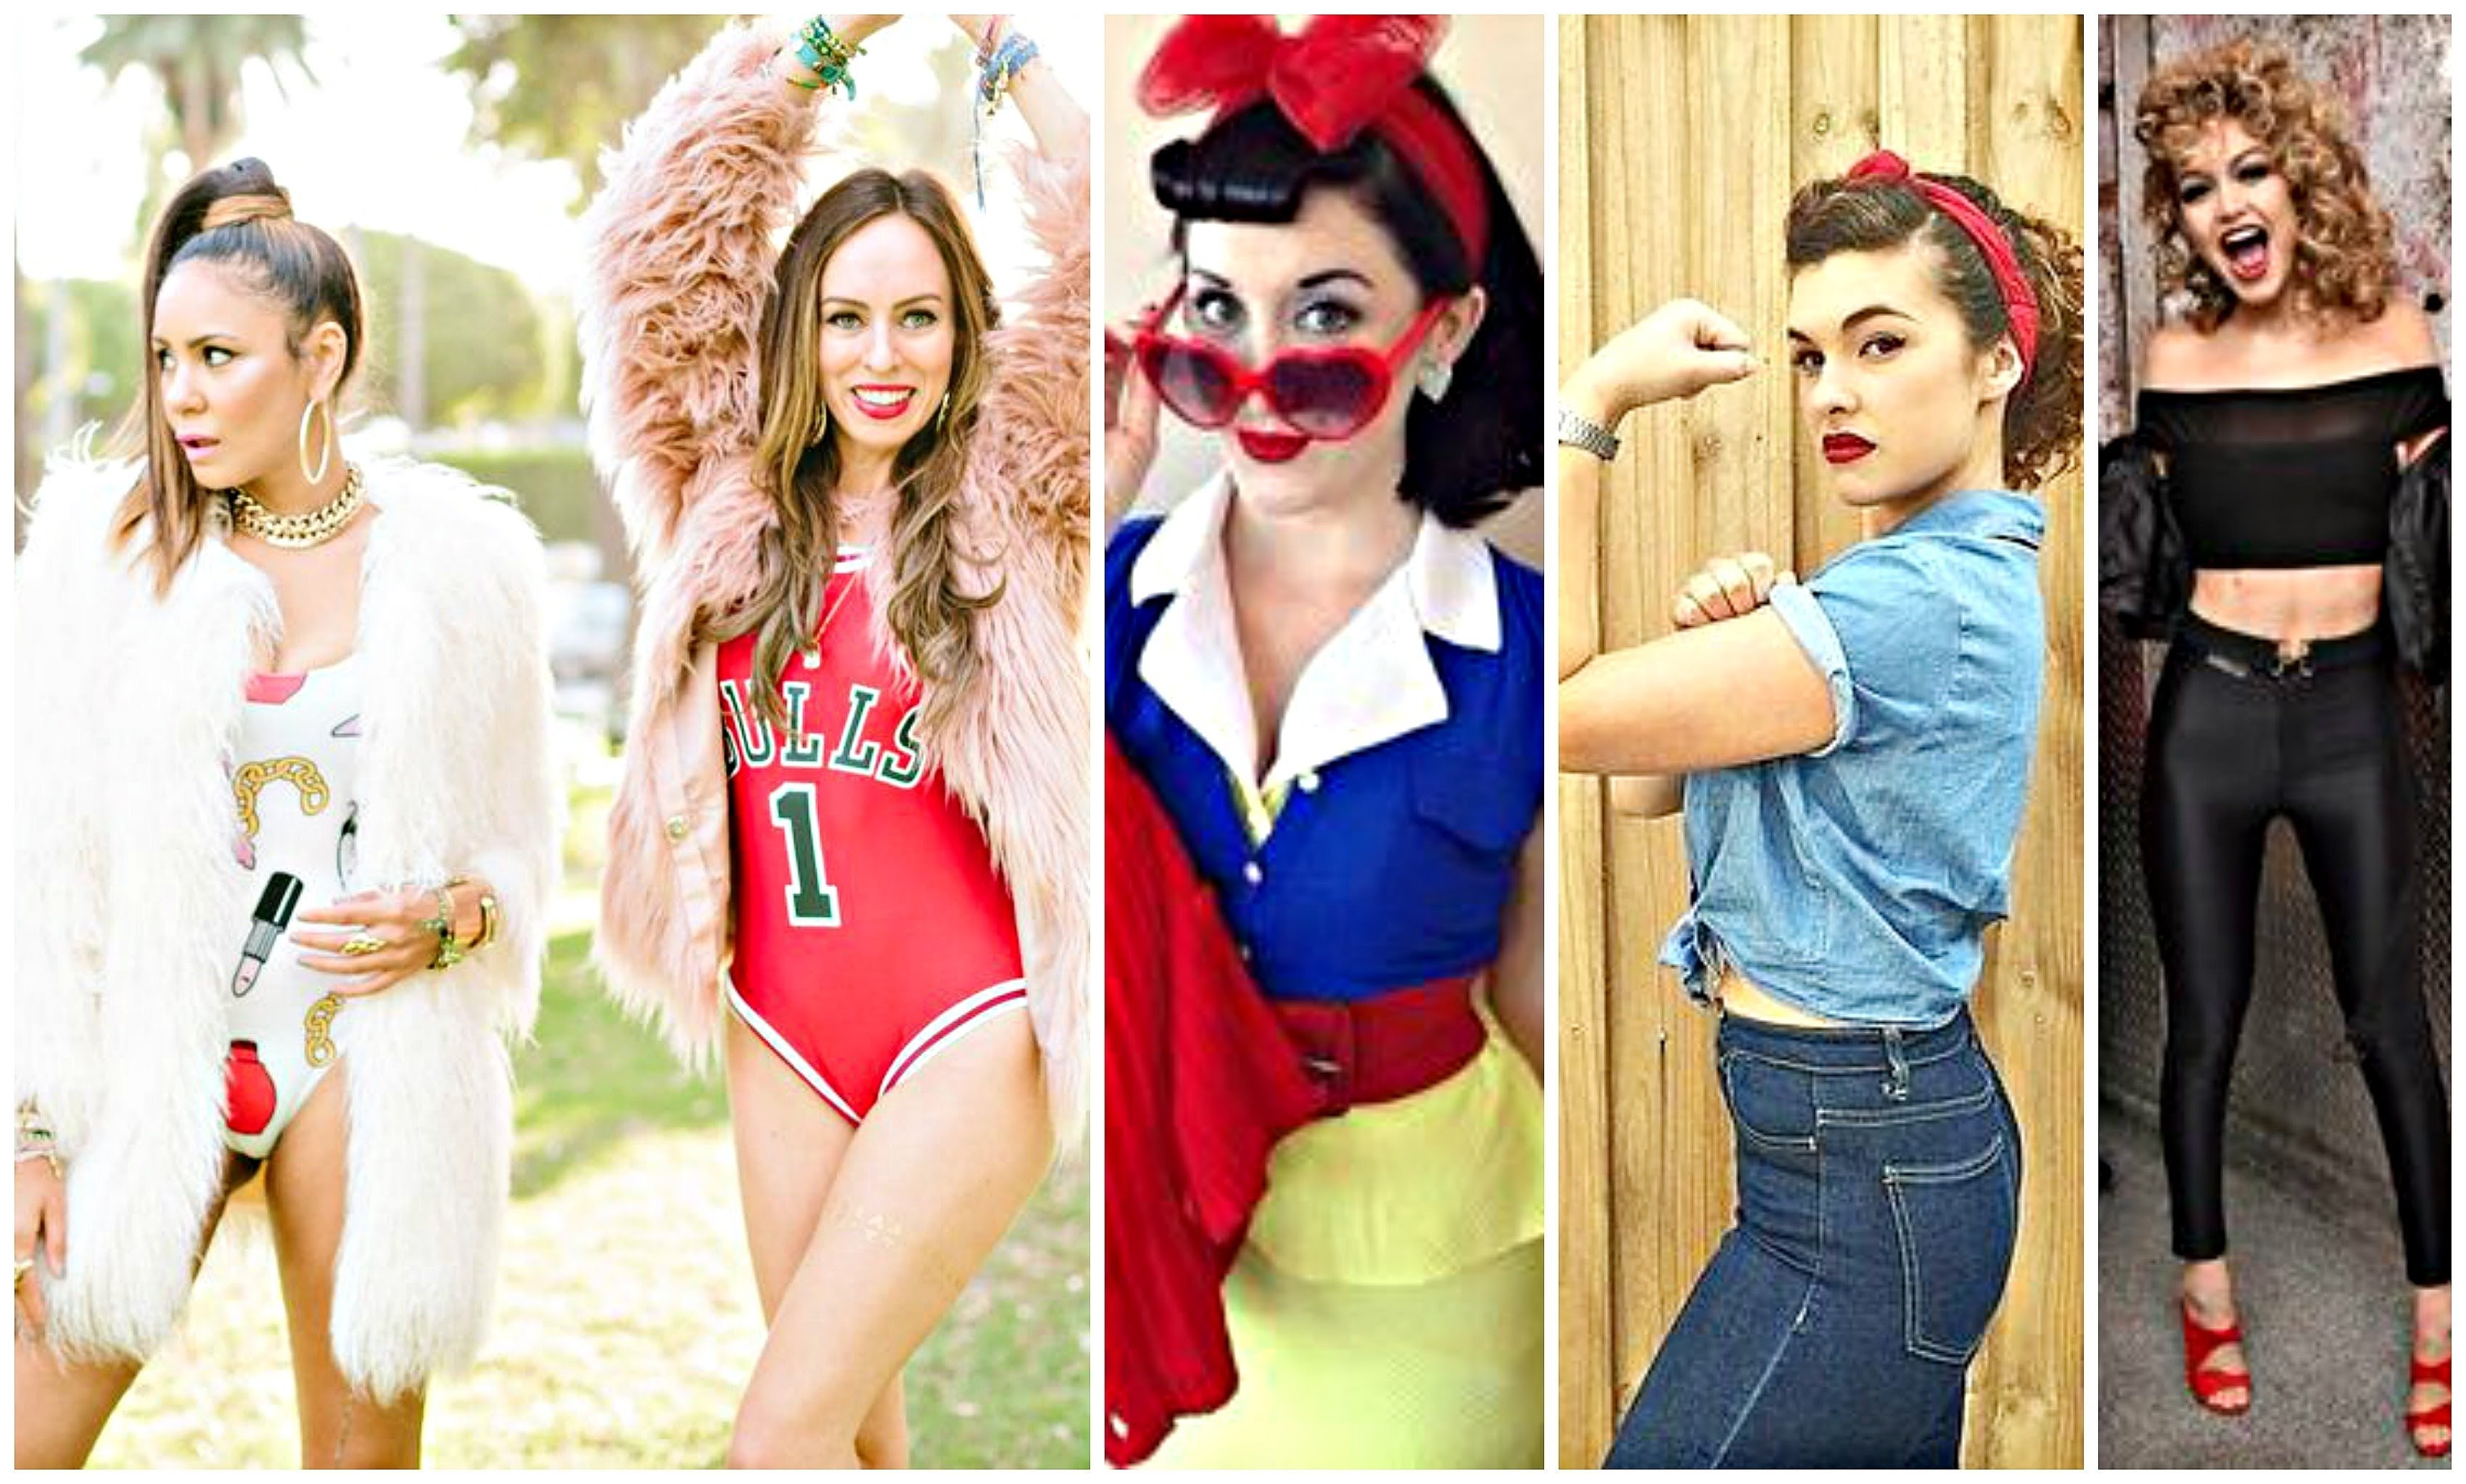 10 Great Cheap Halloween Costume Ideas For Women top halloween costume ideas for women youtube 11 2020